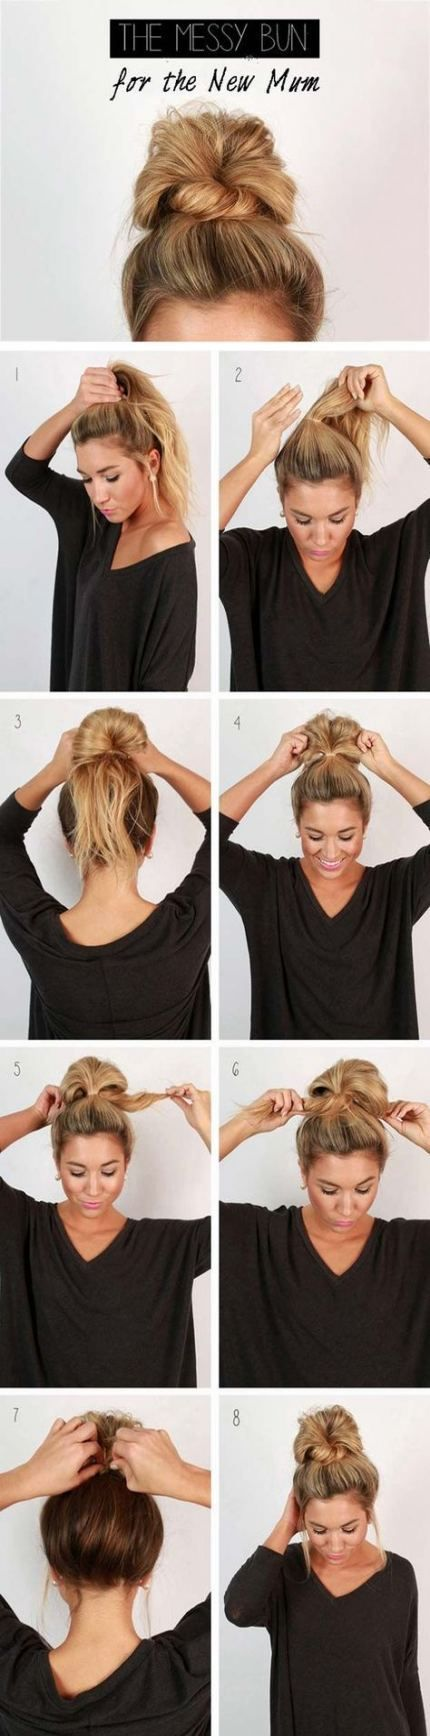 Hairstyles summer lazy girl 63 Trendy Ideas – #girl #hairstyles #ideas #Lazy #summer